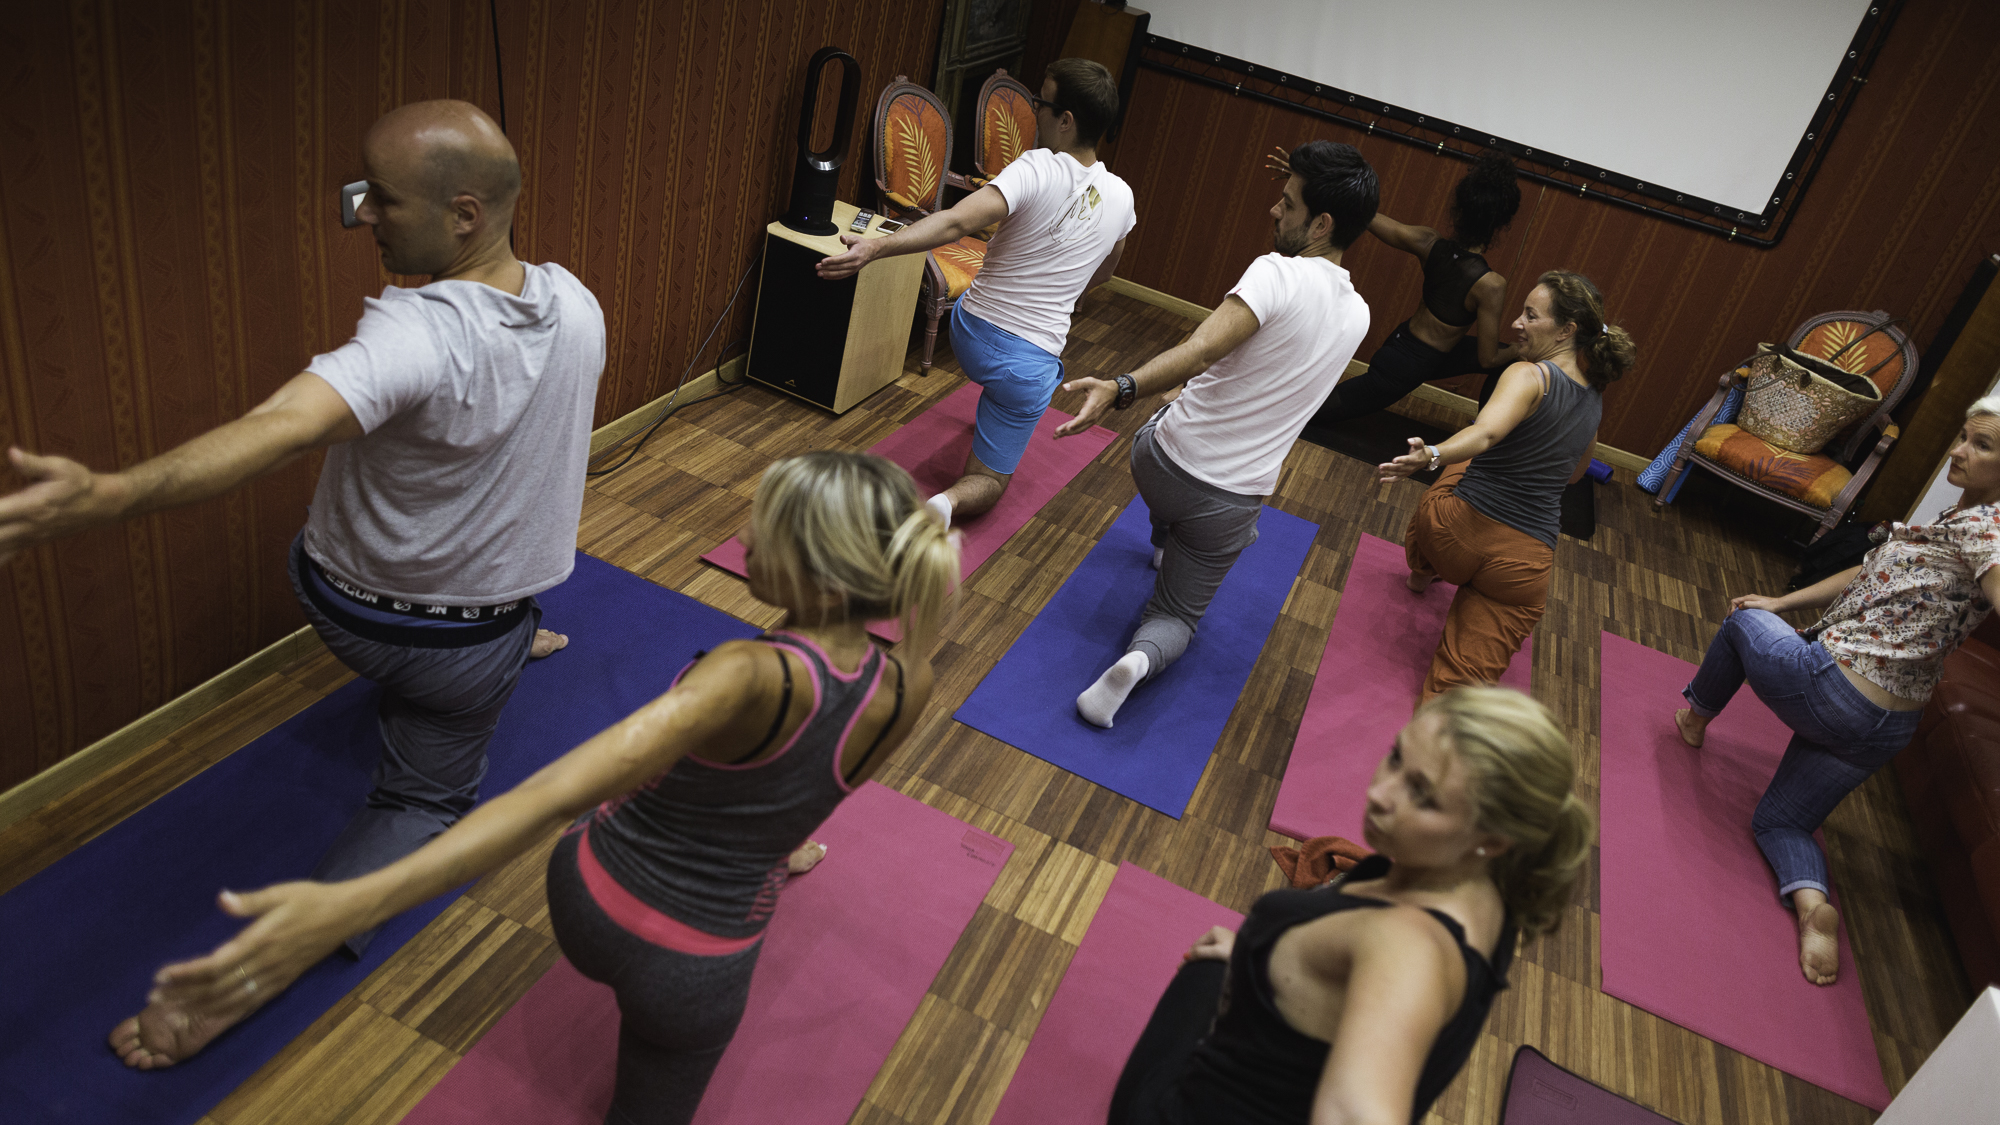 (c) Priscilla Stanley - Me Yoga Launch6